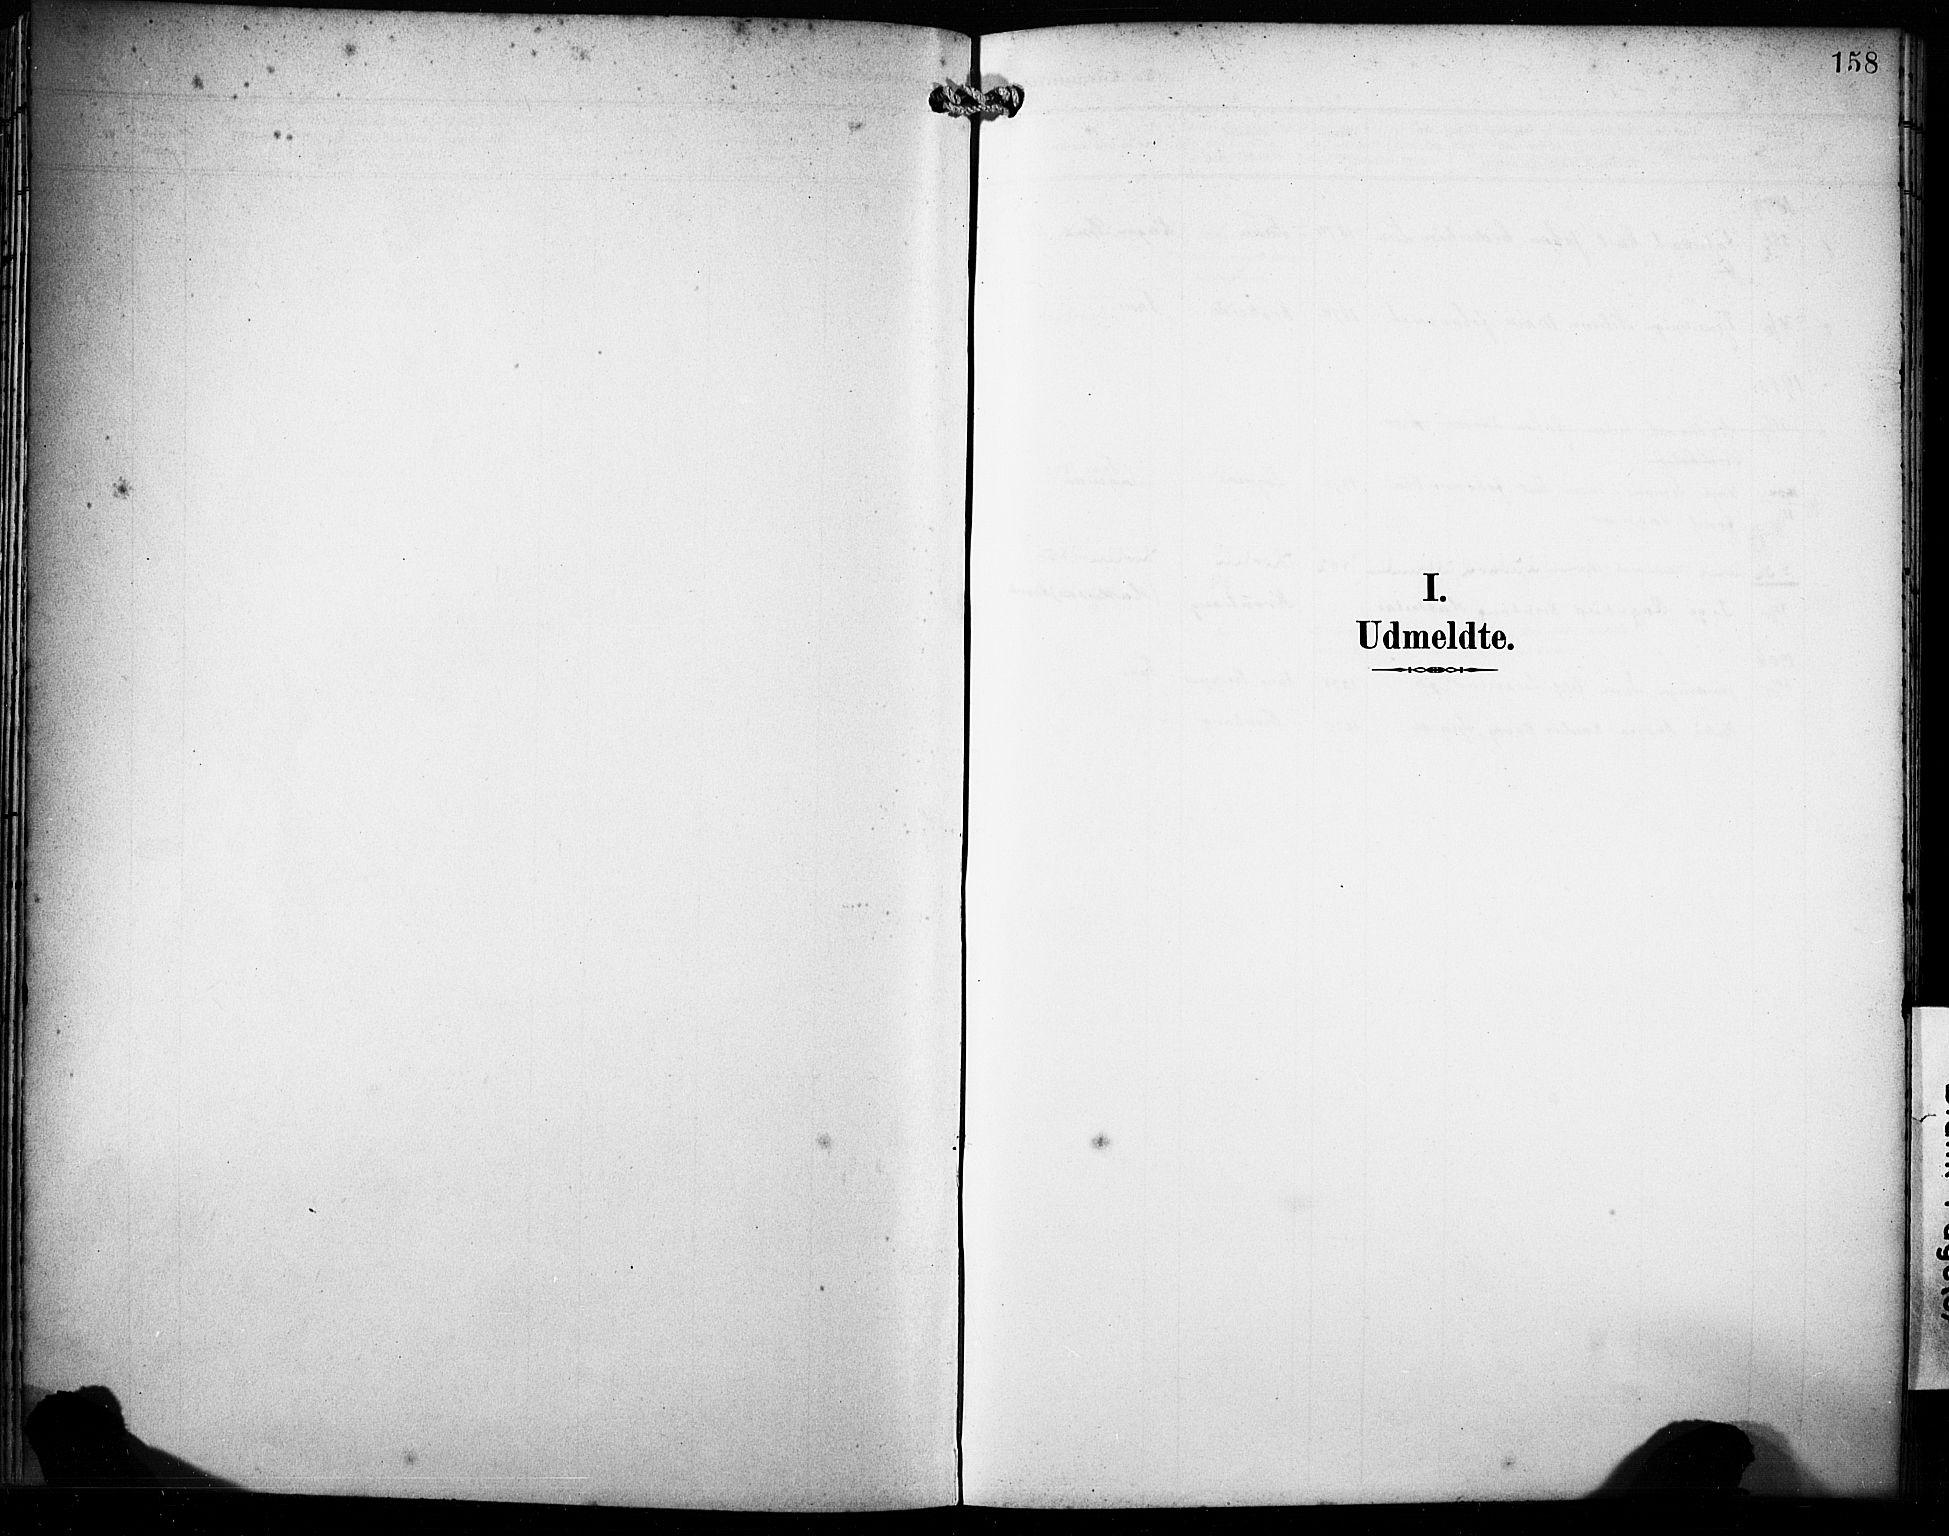 SAB, Fana Sokneprestembete, H/Haa/Haab/L0003: Ministerialbok nr. B 3, 1898-1907, s. 158